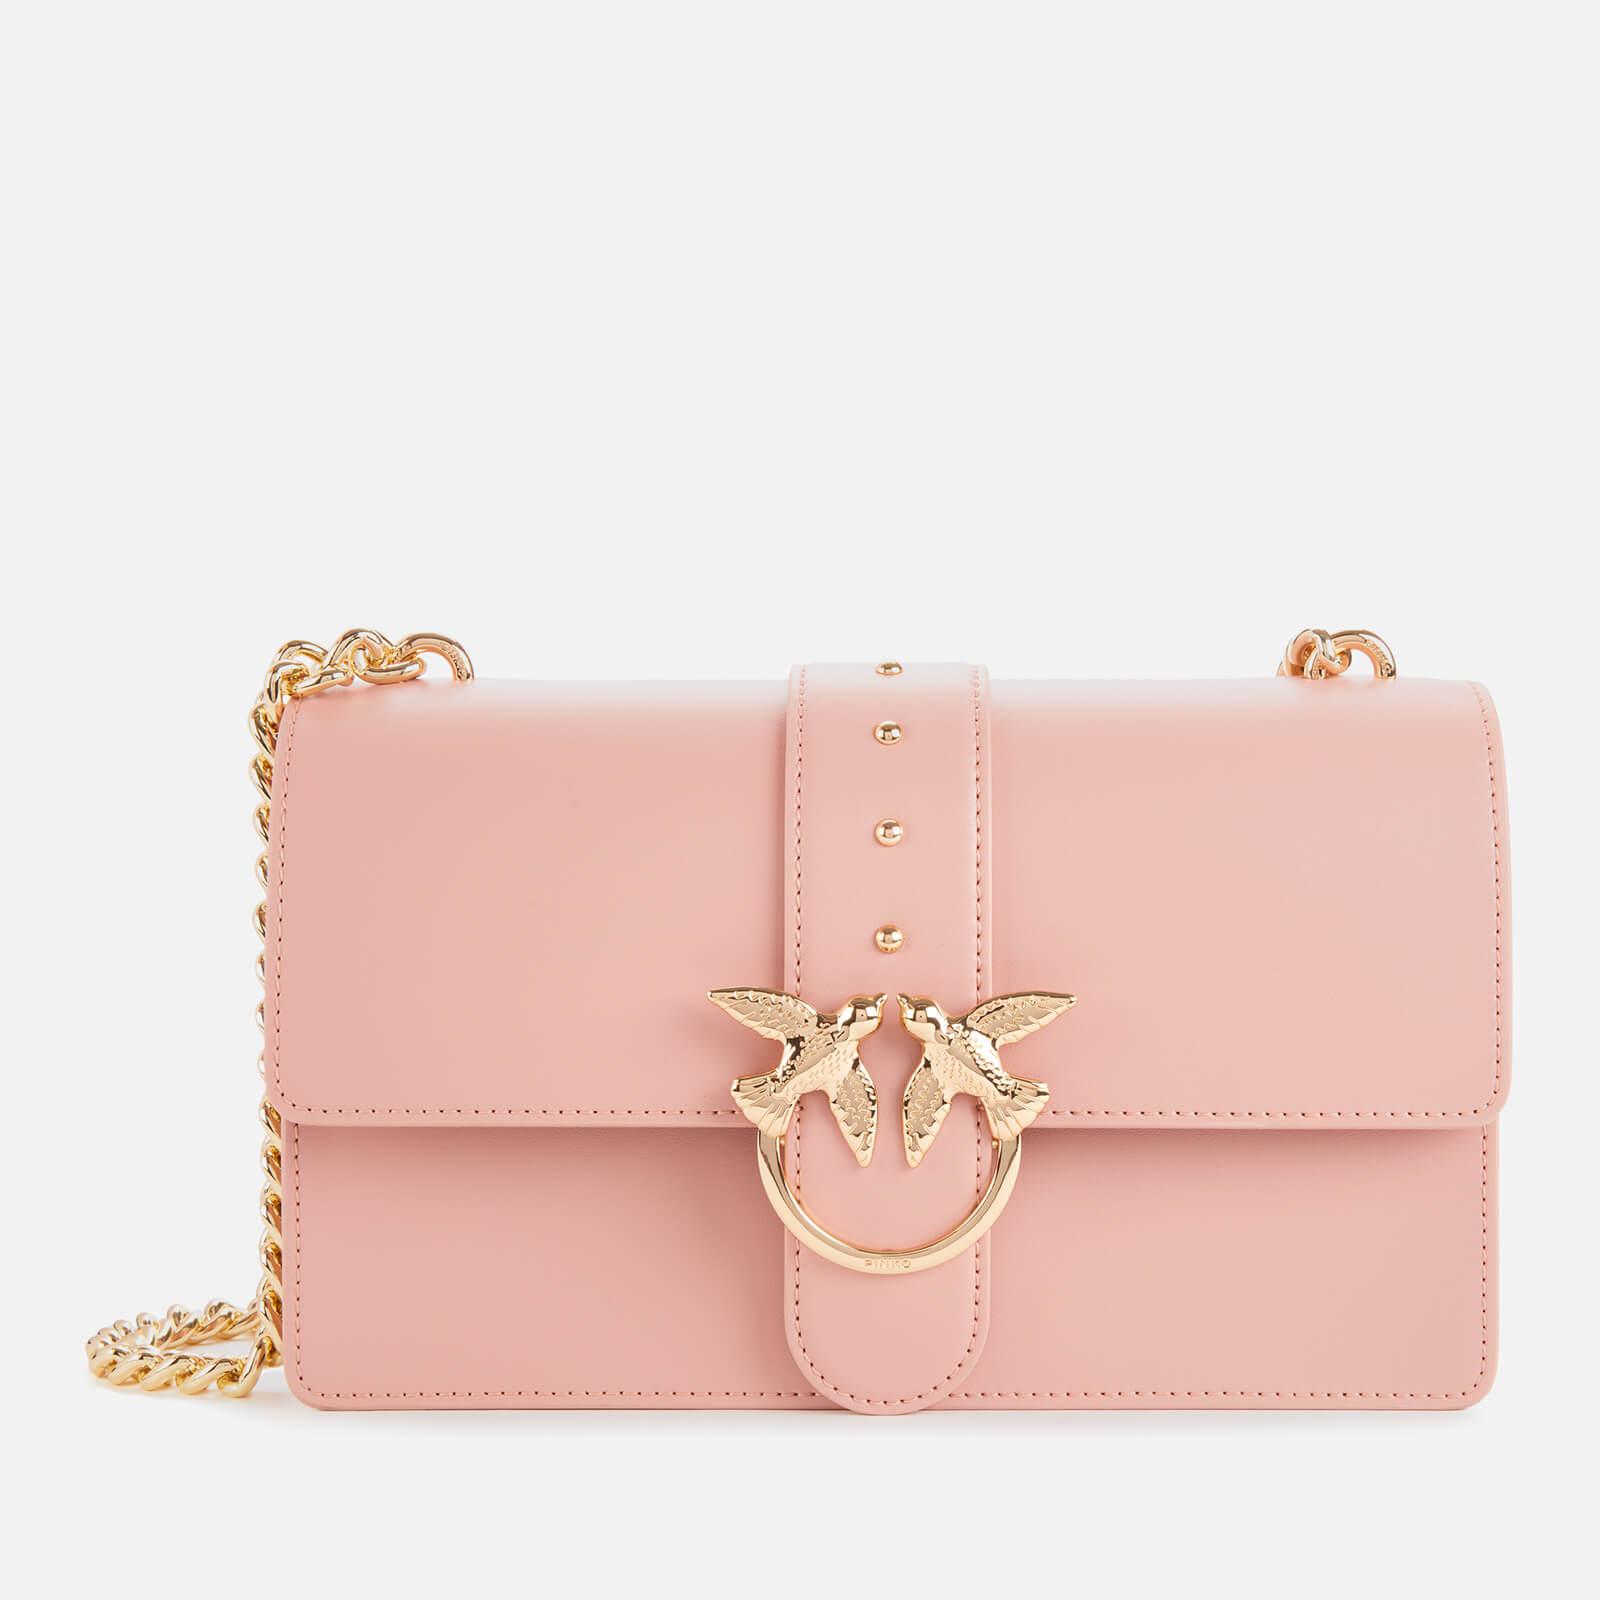 Pinko Women's Classic Love Shoulder Bag Pink